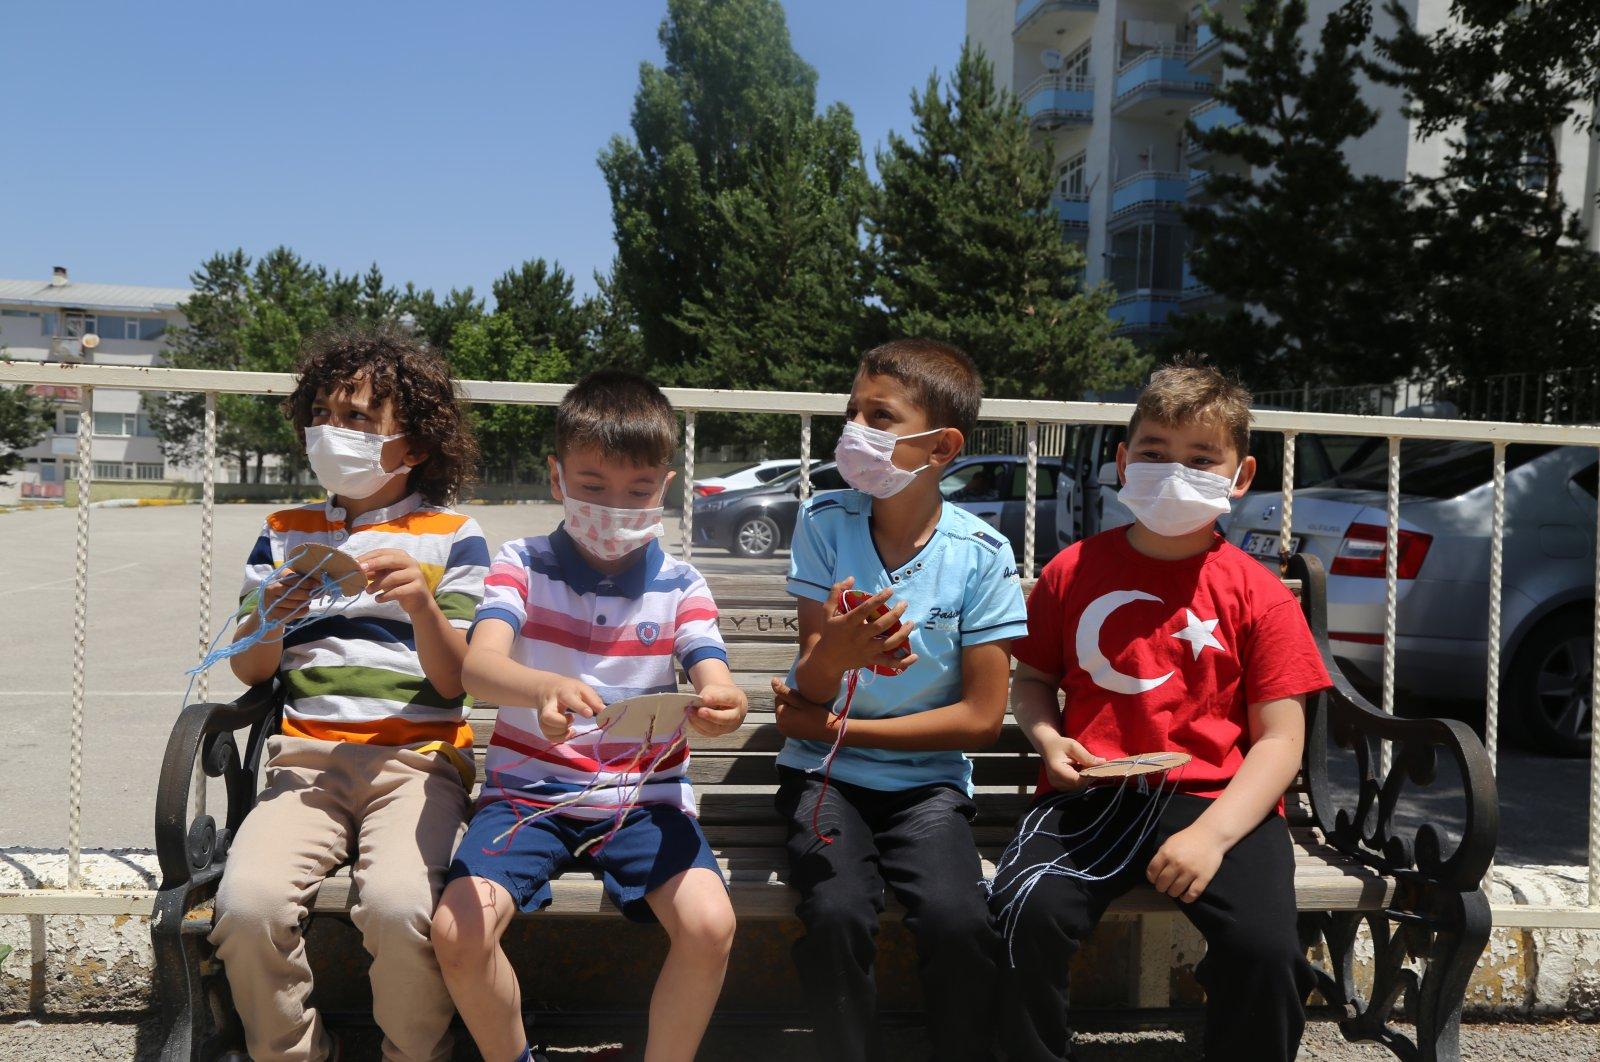 Children wearing protective masks sit on a bench, in Erzurum, eastern Turkey, June 21, 2021. (AA PHOTO)